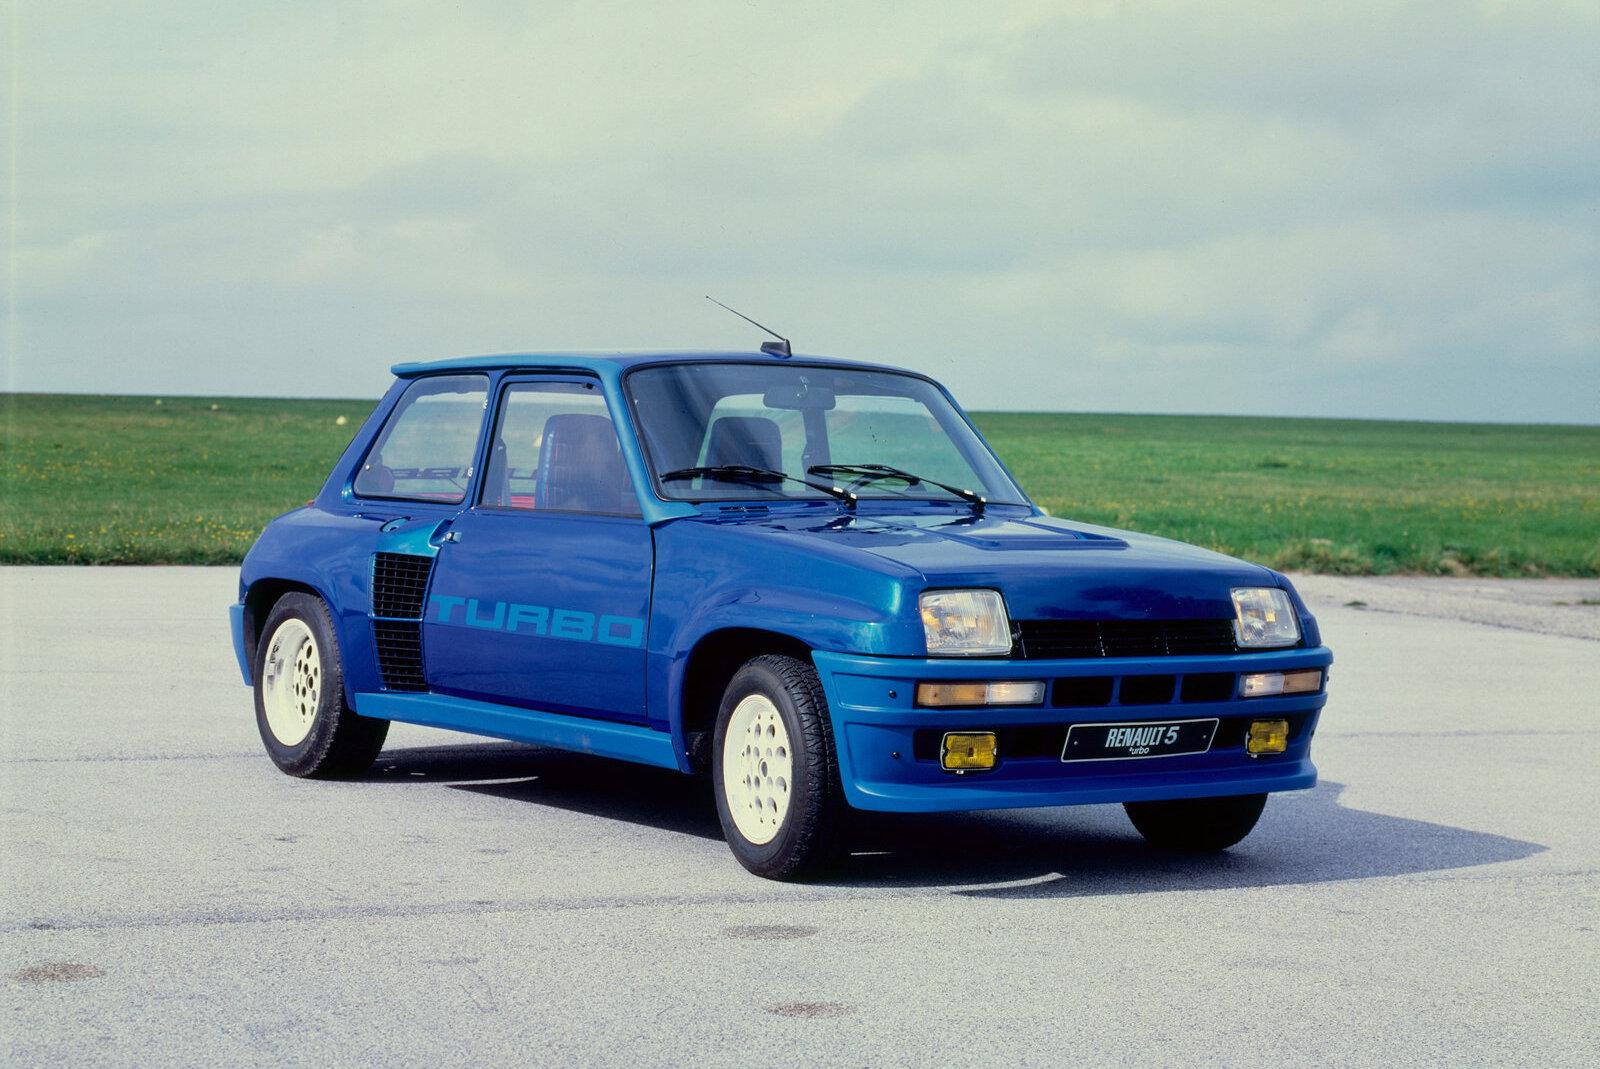 Renault 5 Turbo 1979 1600 01